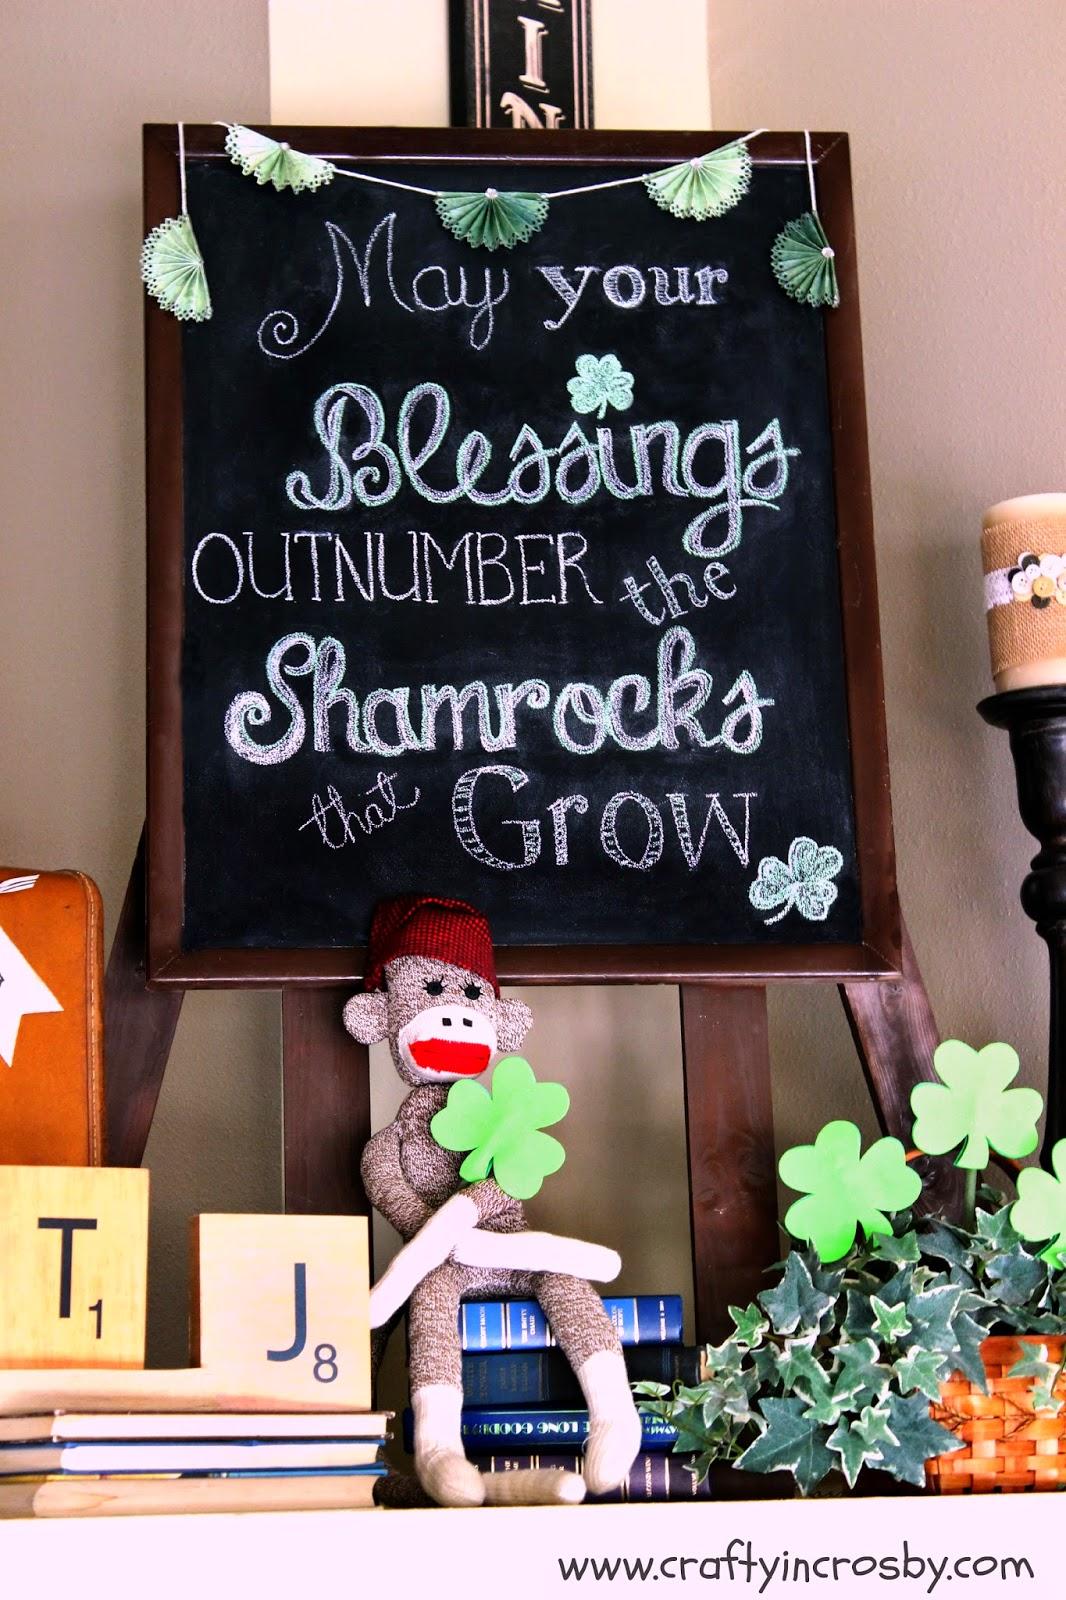 shamrocks, Irish Blessing, St. Paddy's Day, chalkboard art, chalkboard DIY